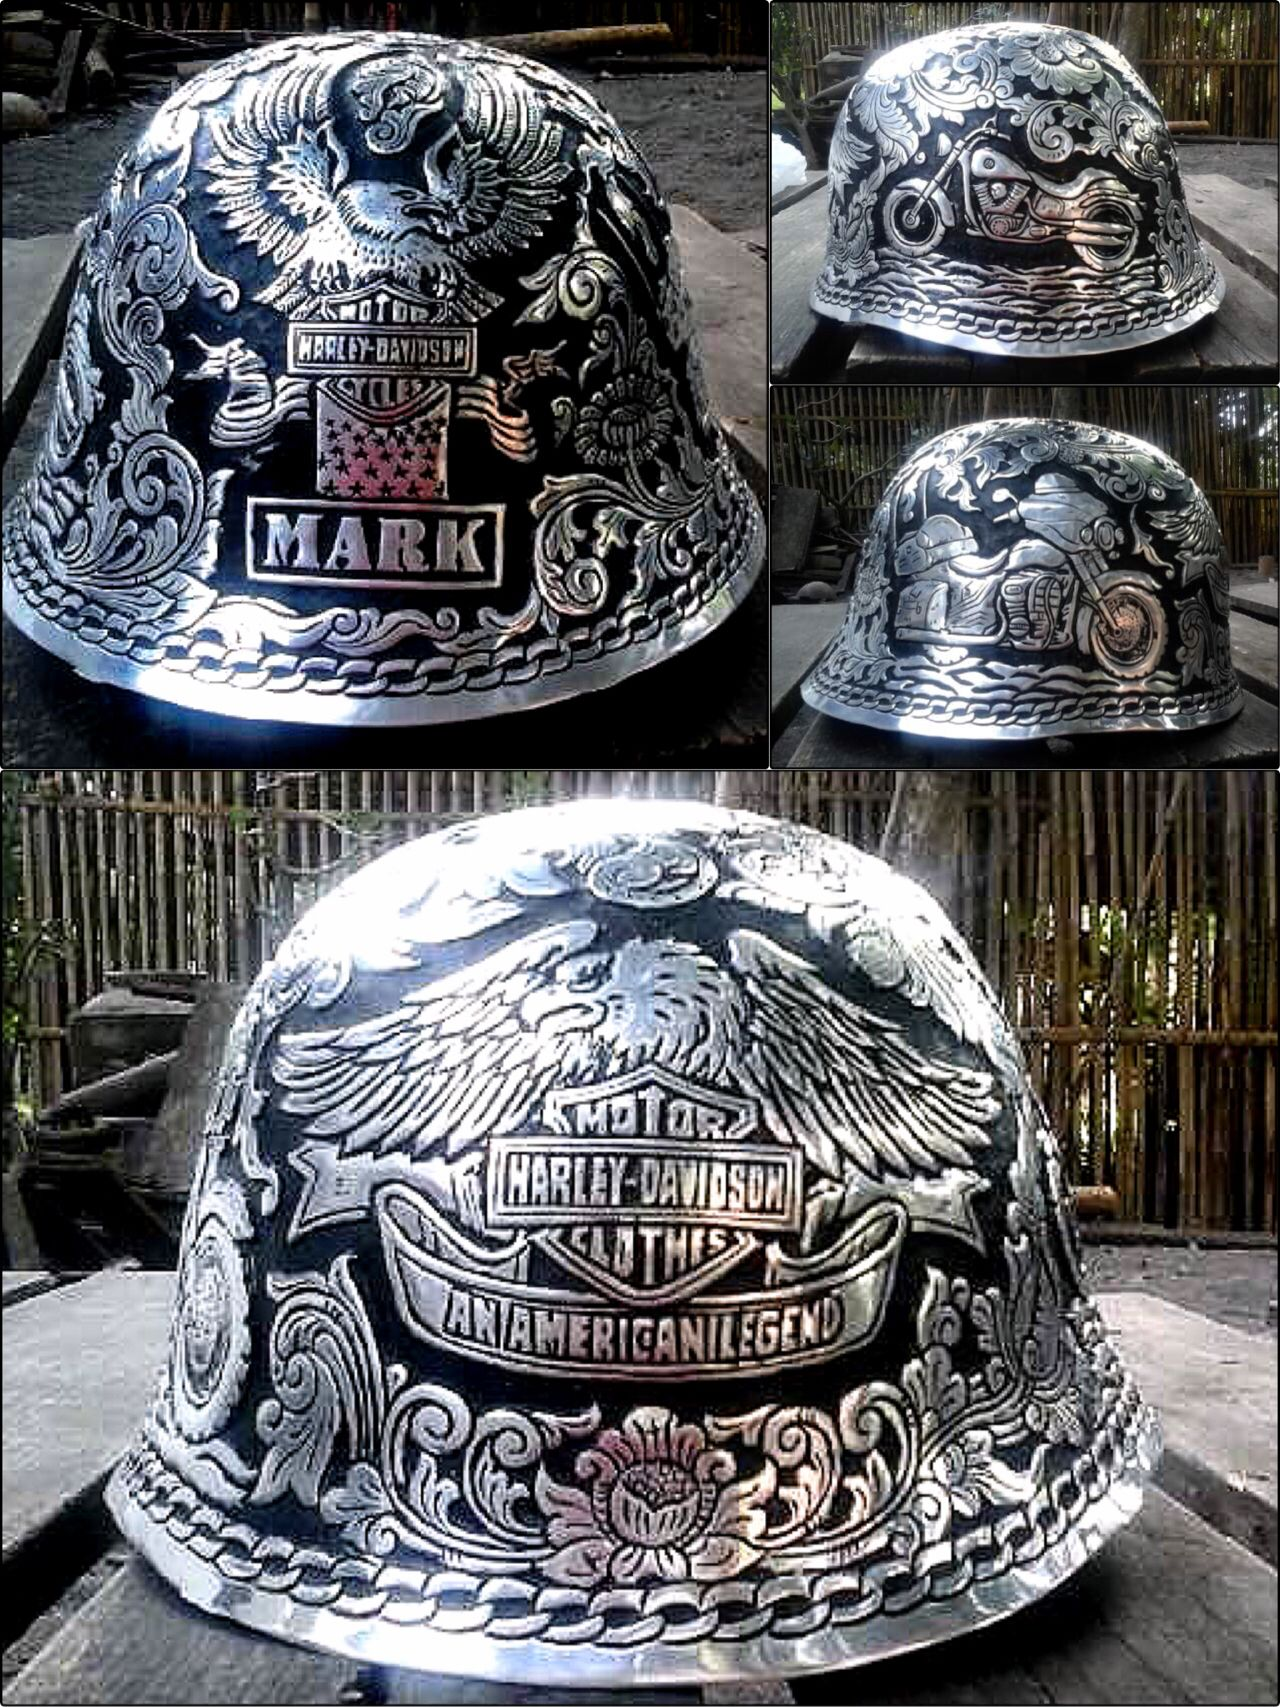 cc113380 #engraved #hardhat with #HarleyDavidson images Hard Hats, Custom Engraving,  Harley Davidson